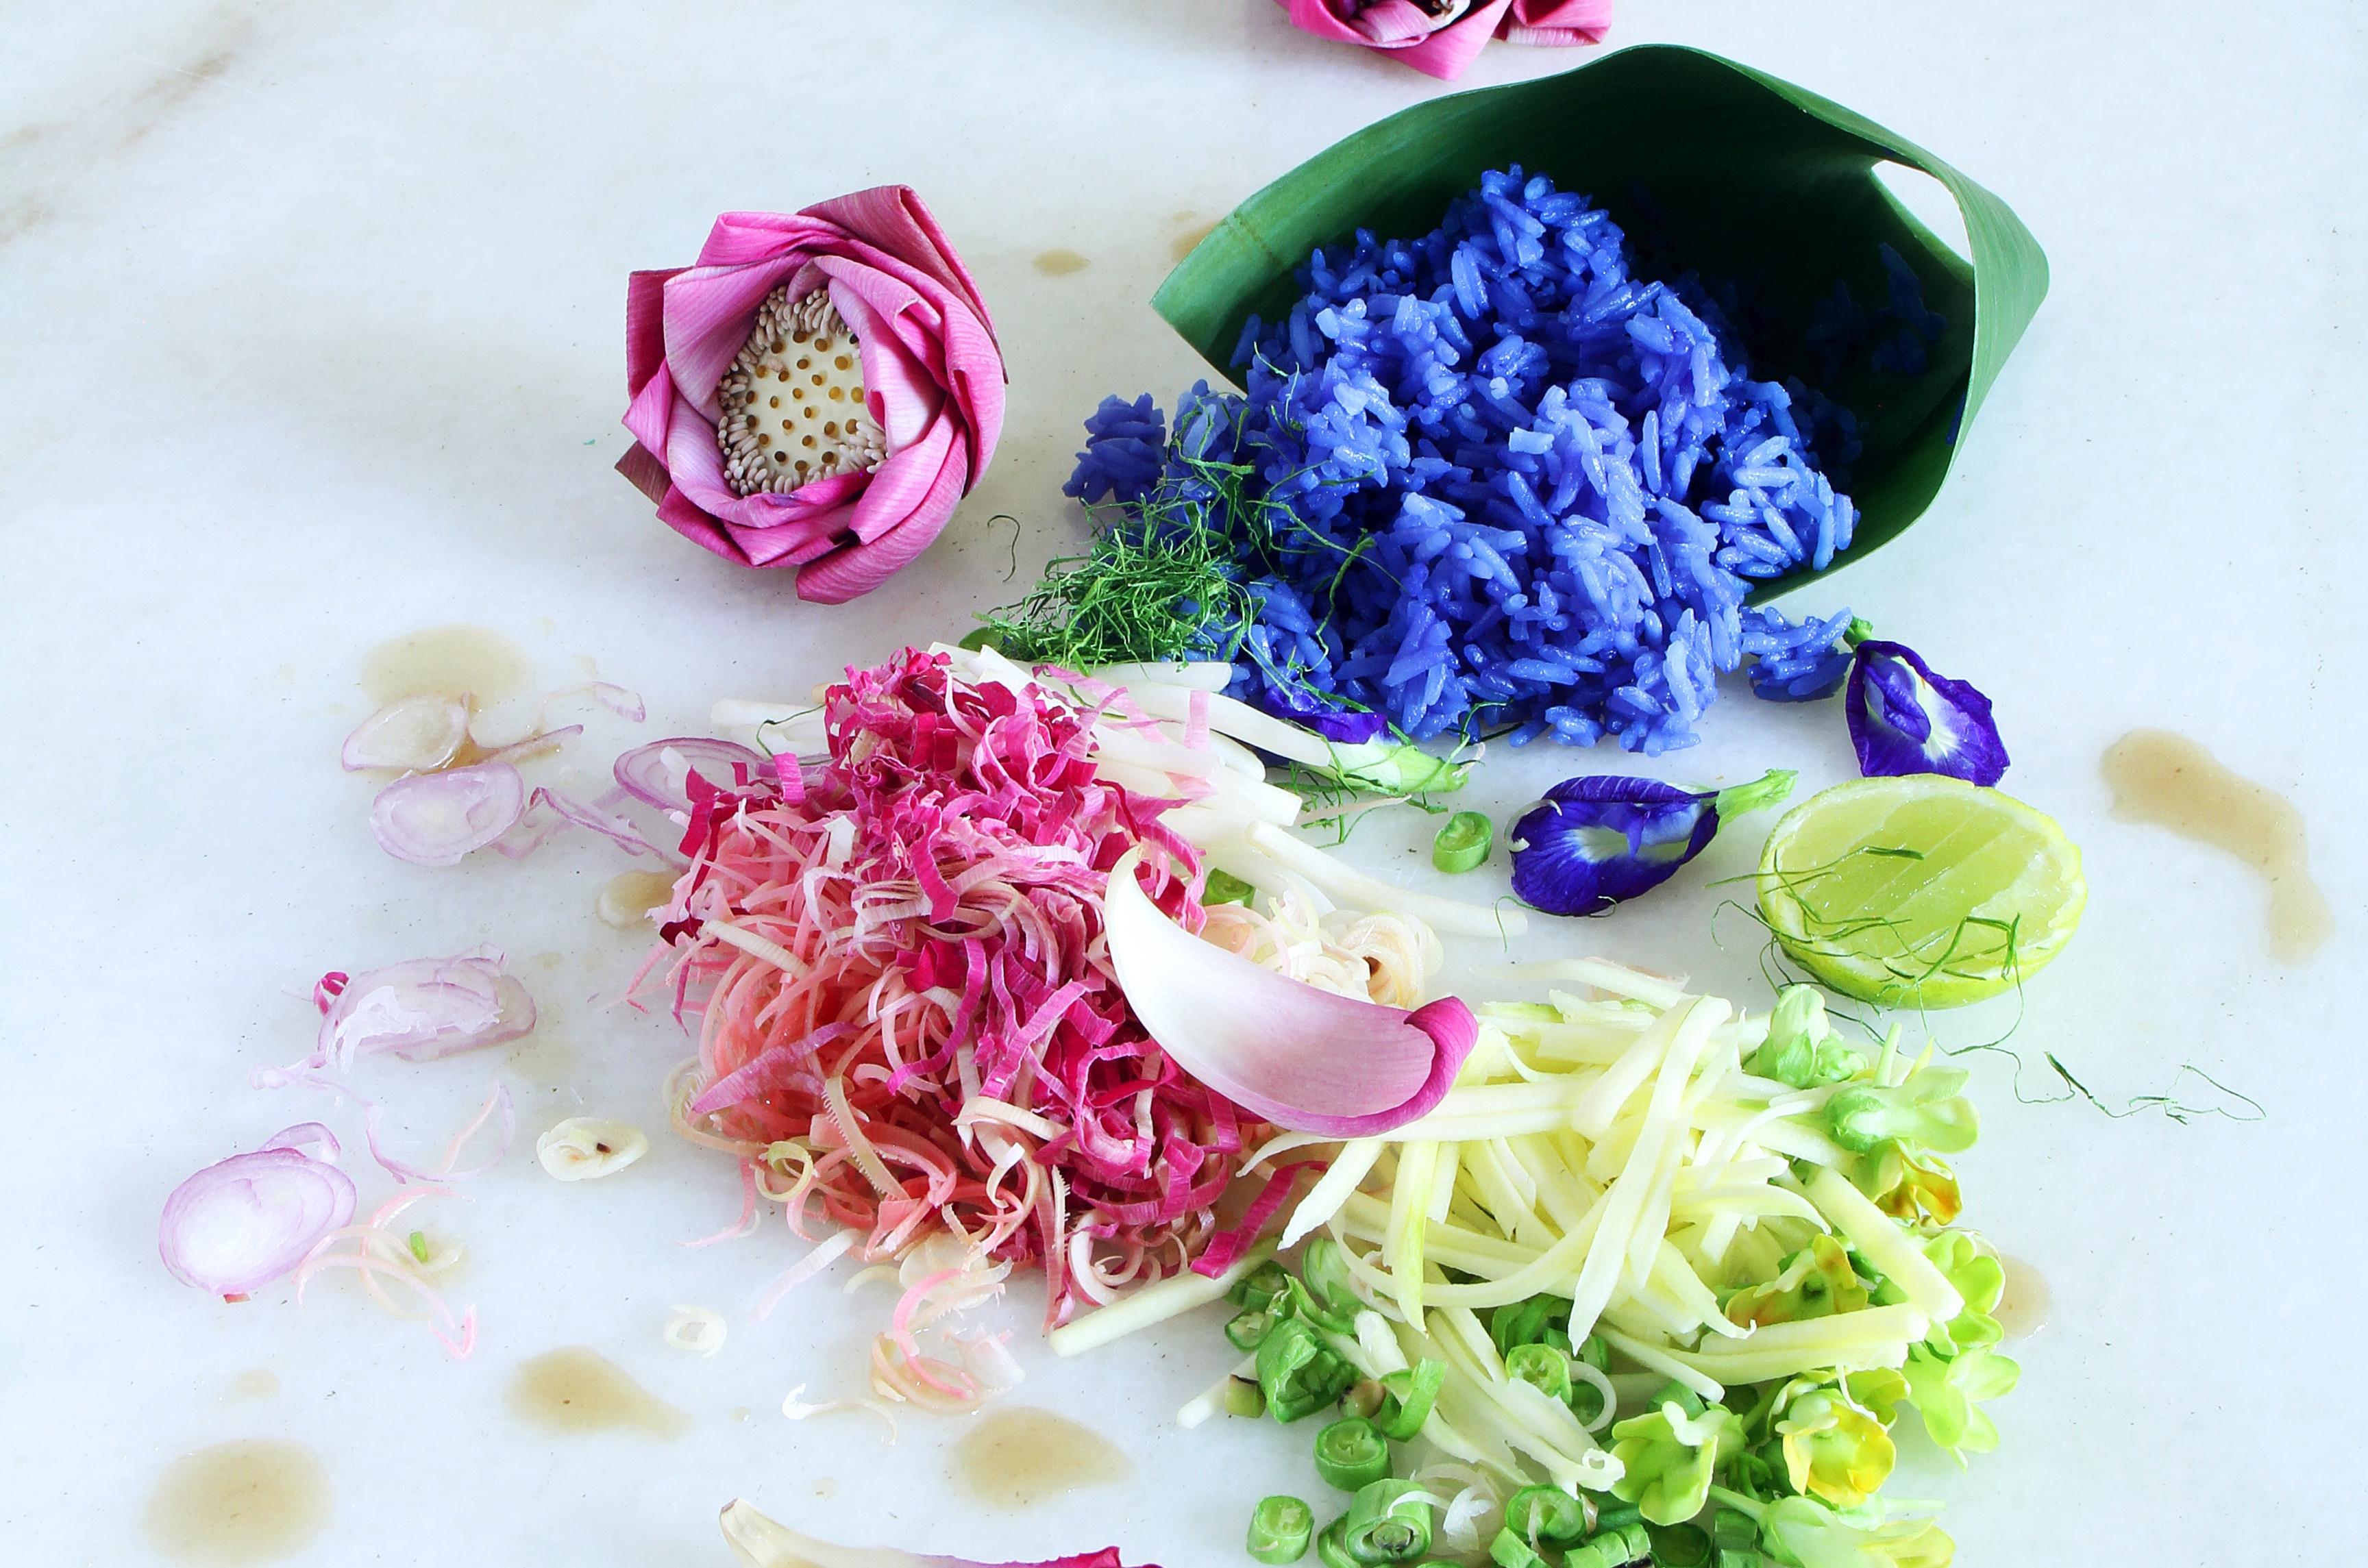 Nasi Kerabu with Flower Salad